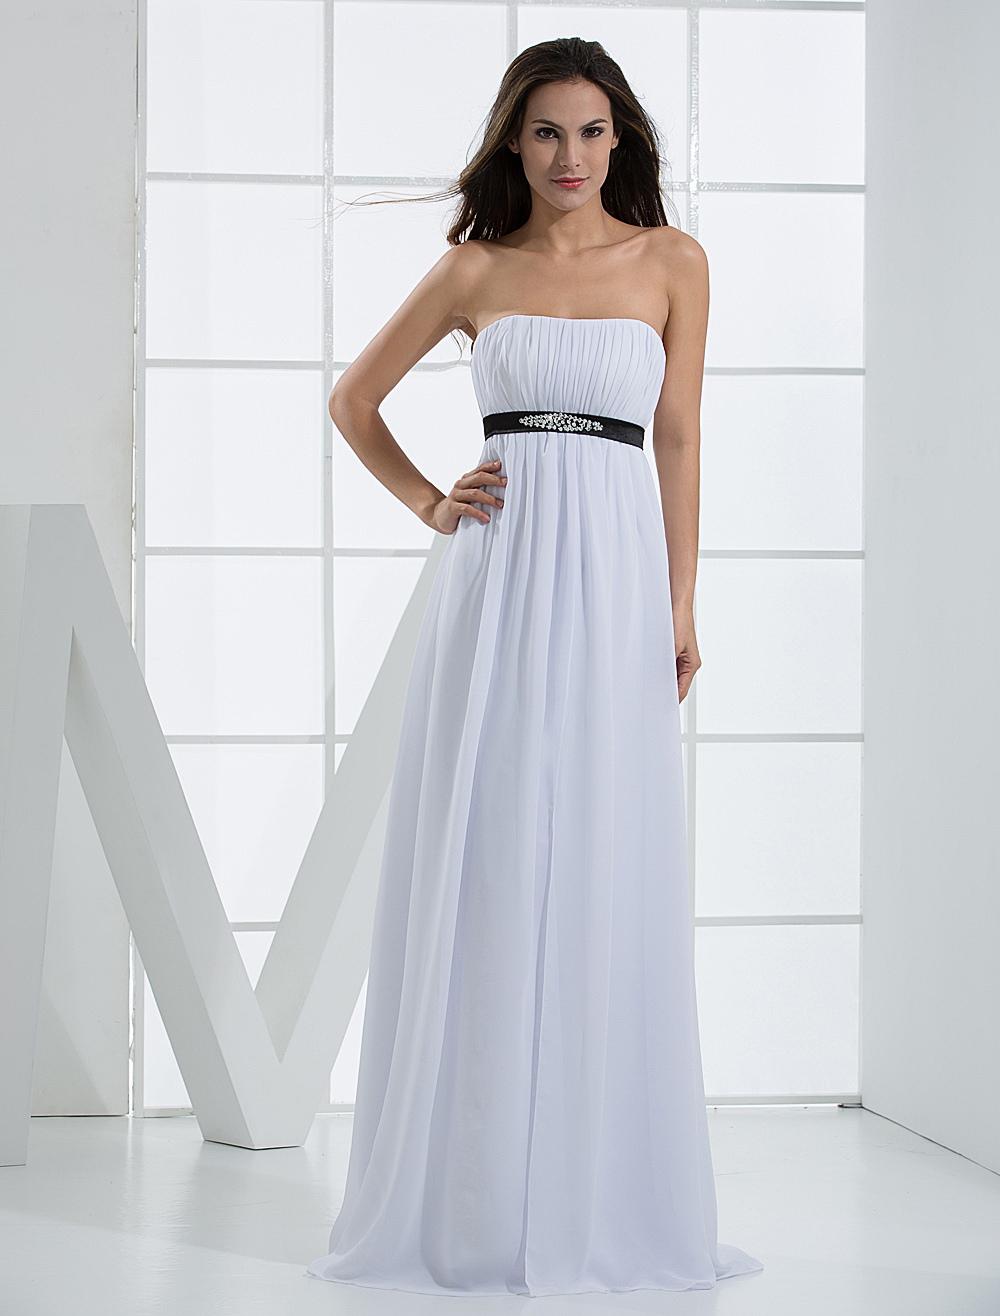 Elegant White Chiffon A-line Black Sash Womens Evening Dress